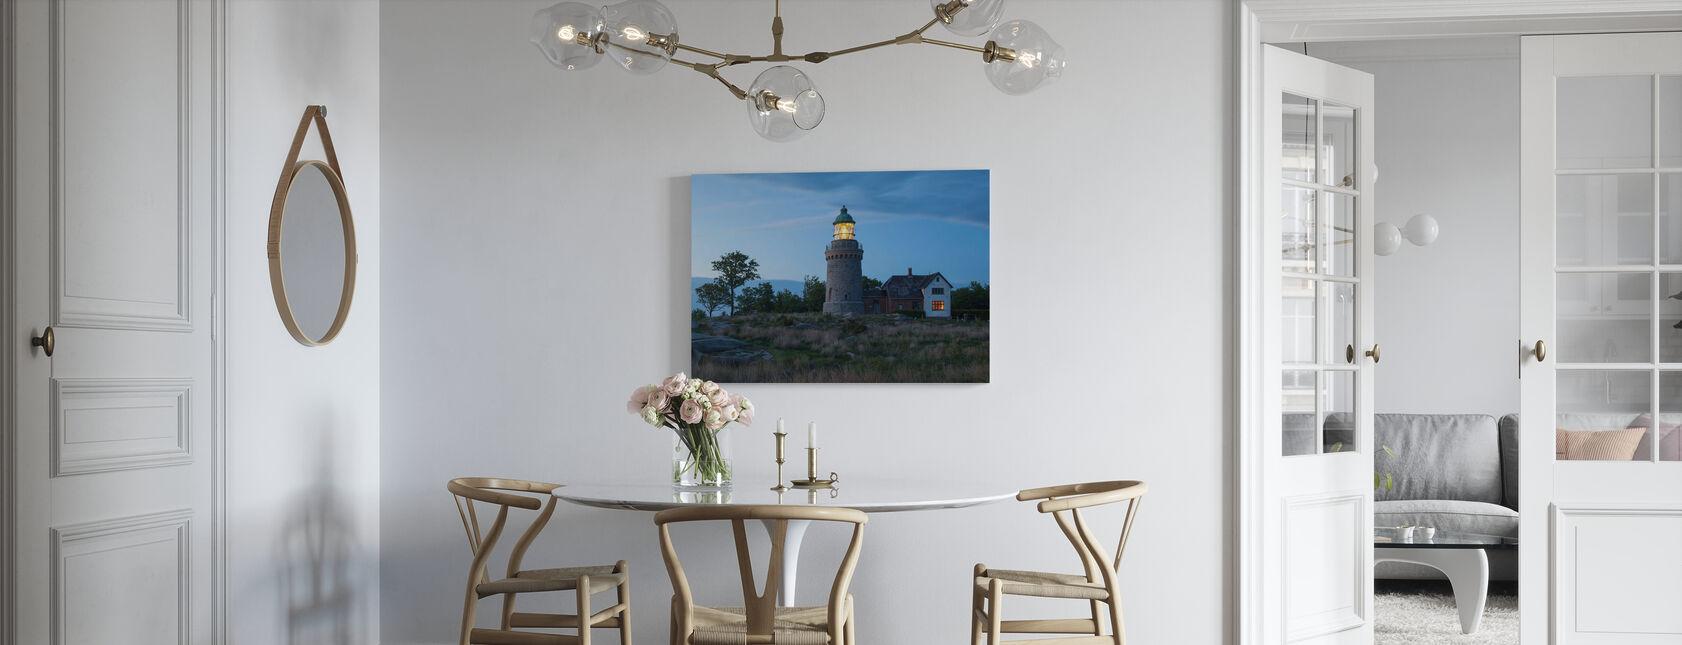 Fyr i Bornholm, Danmark - Canvastavla - Kök